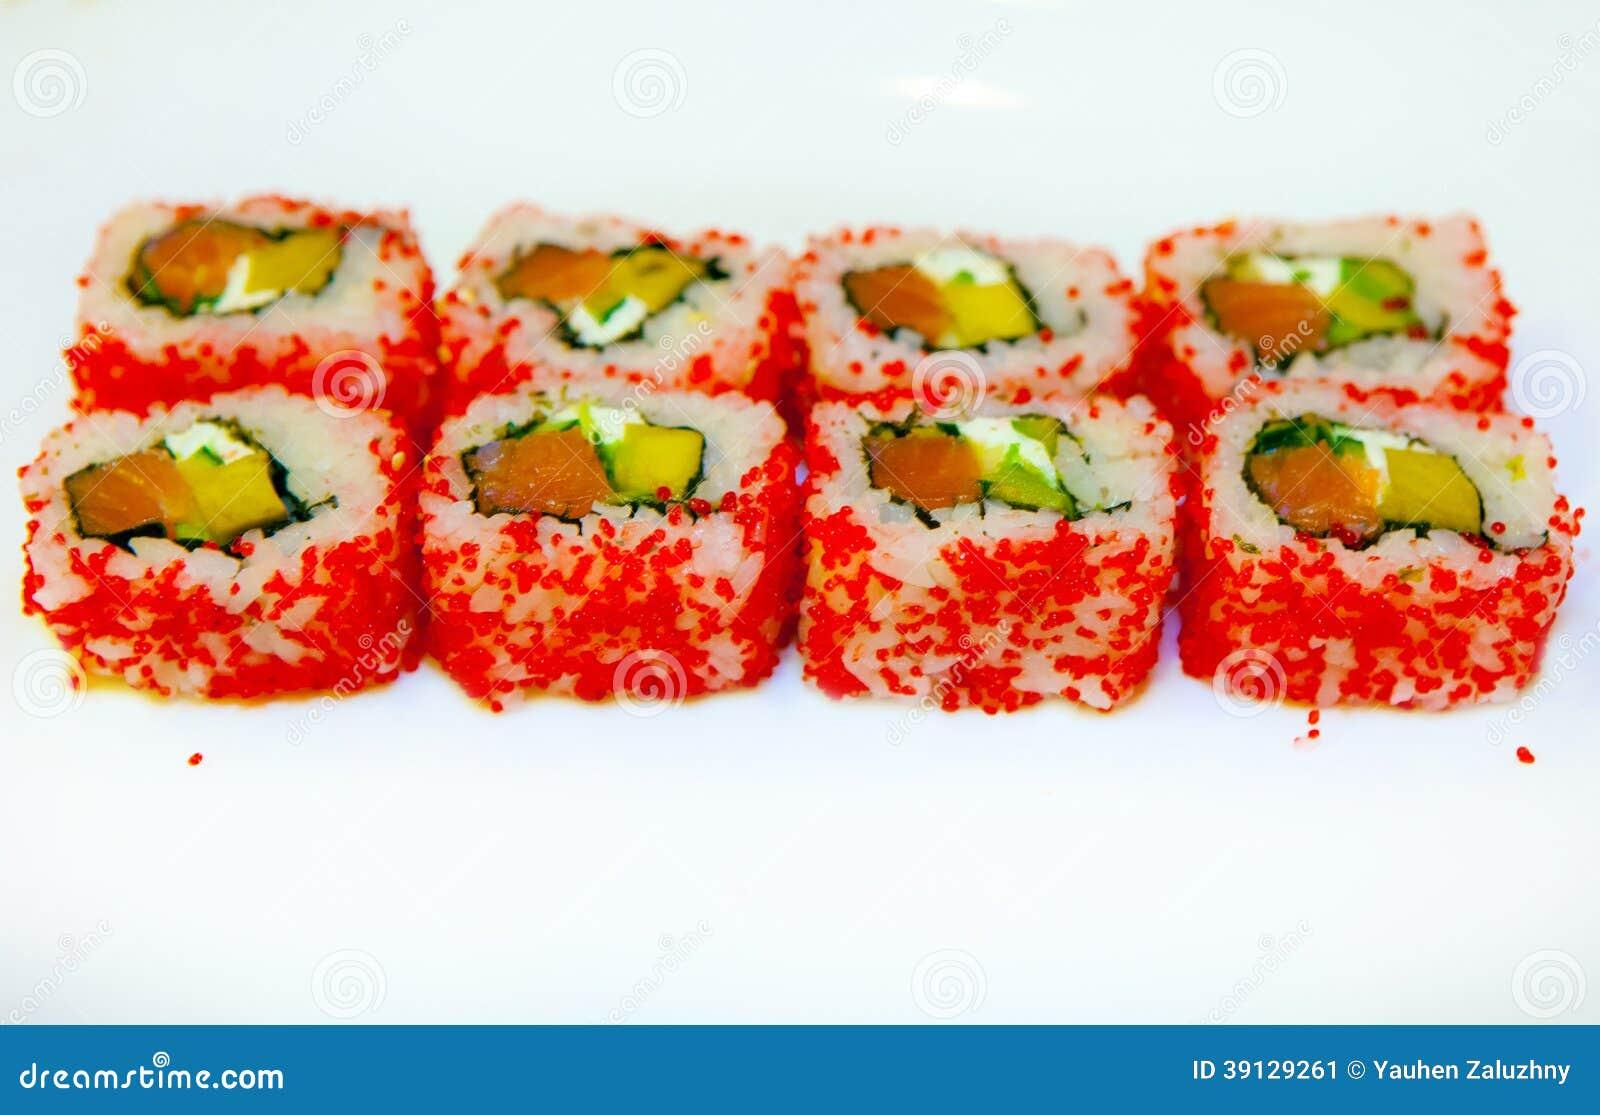 Sushi With Eel, Flying Fish Roe Stock Photo - Image: 39129260